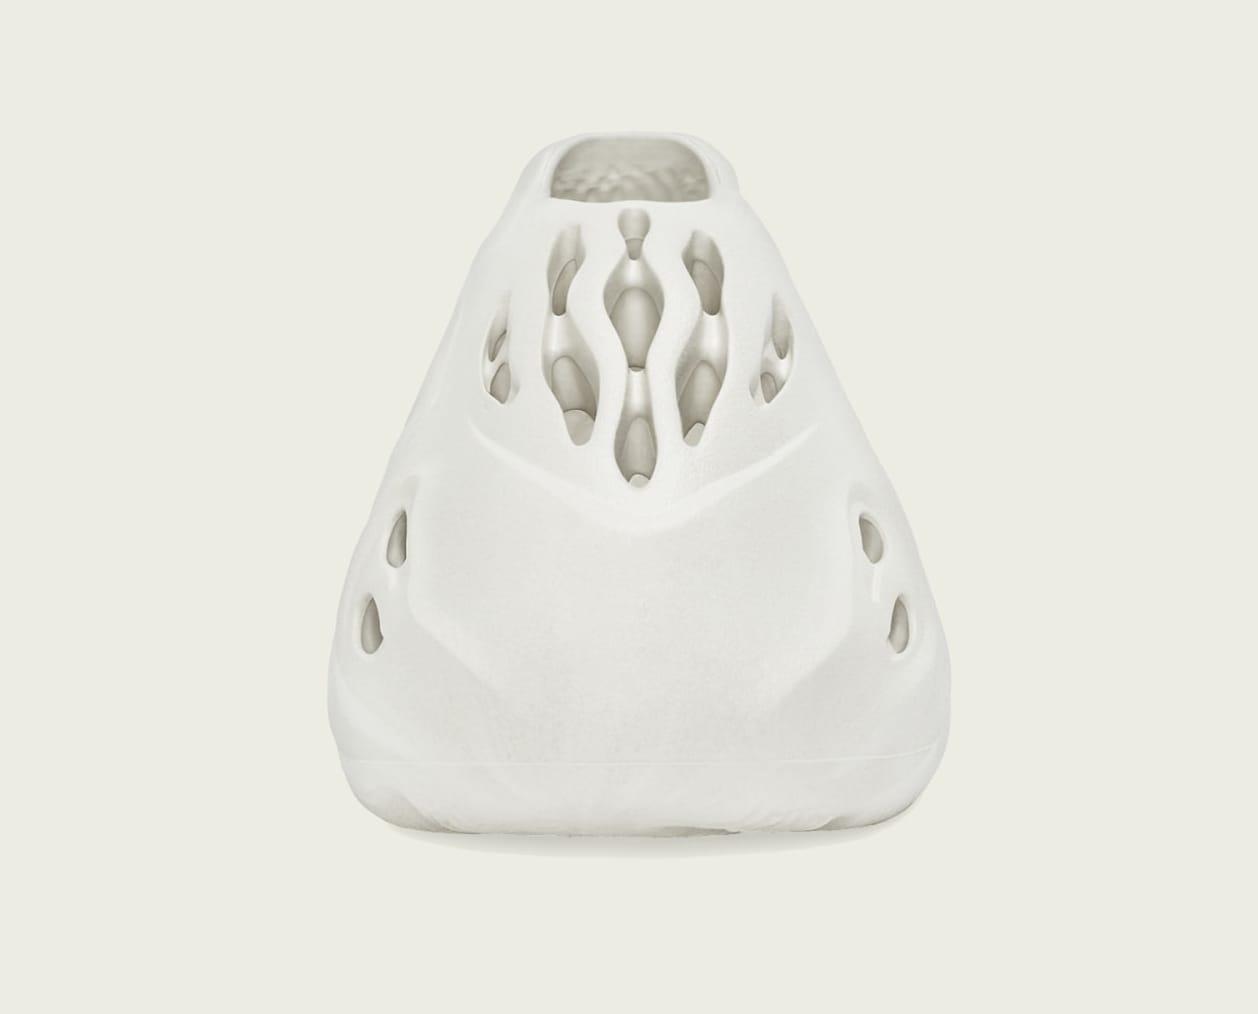 Adidas Yeezy Foam Runner 'Sand' FY4567 Front